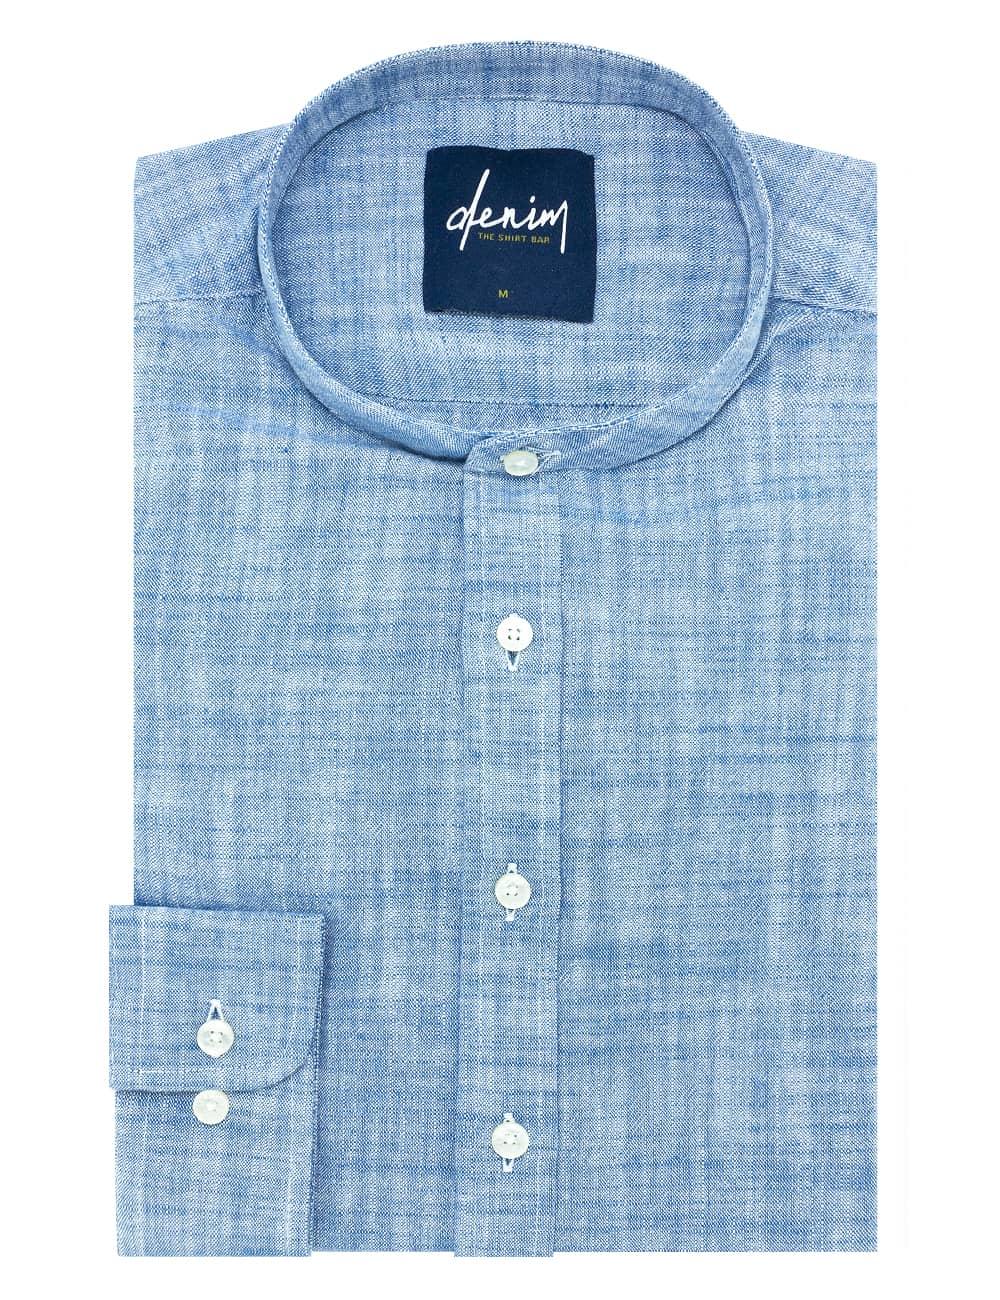 RF Solid Blue Mandarin Collar Denim Collection 100% Cotton Long Sleeve Single Cuff Shirt RF11B2.7